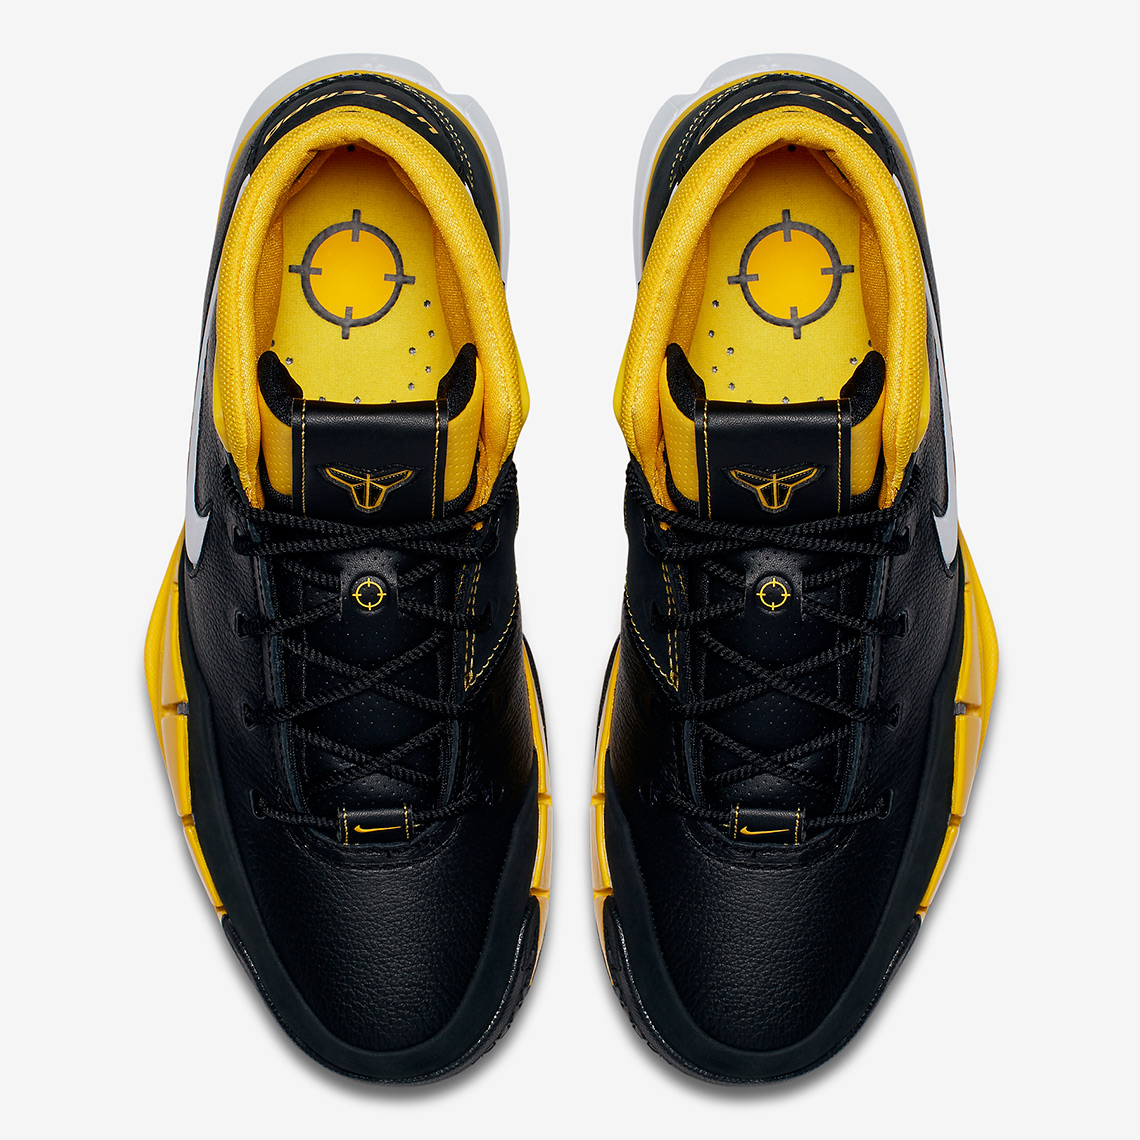 nike-zoom-kobe-1-protro-black-yellow-release-date-7.jpg